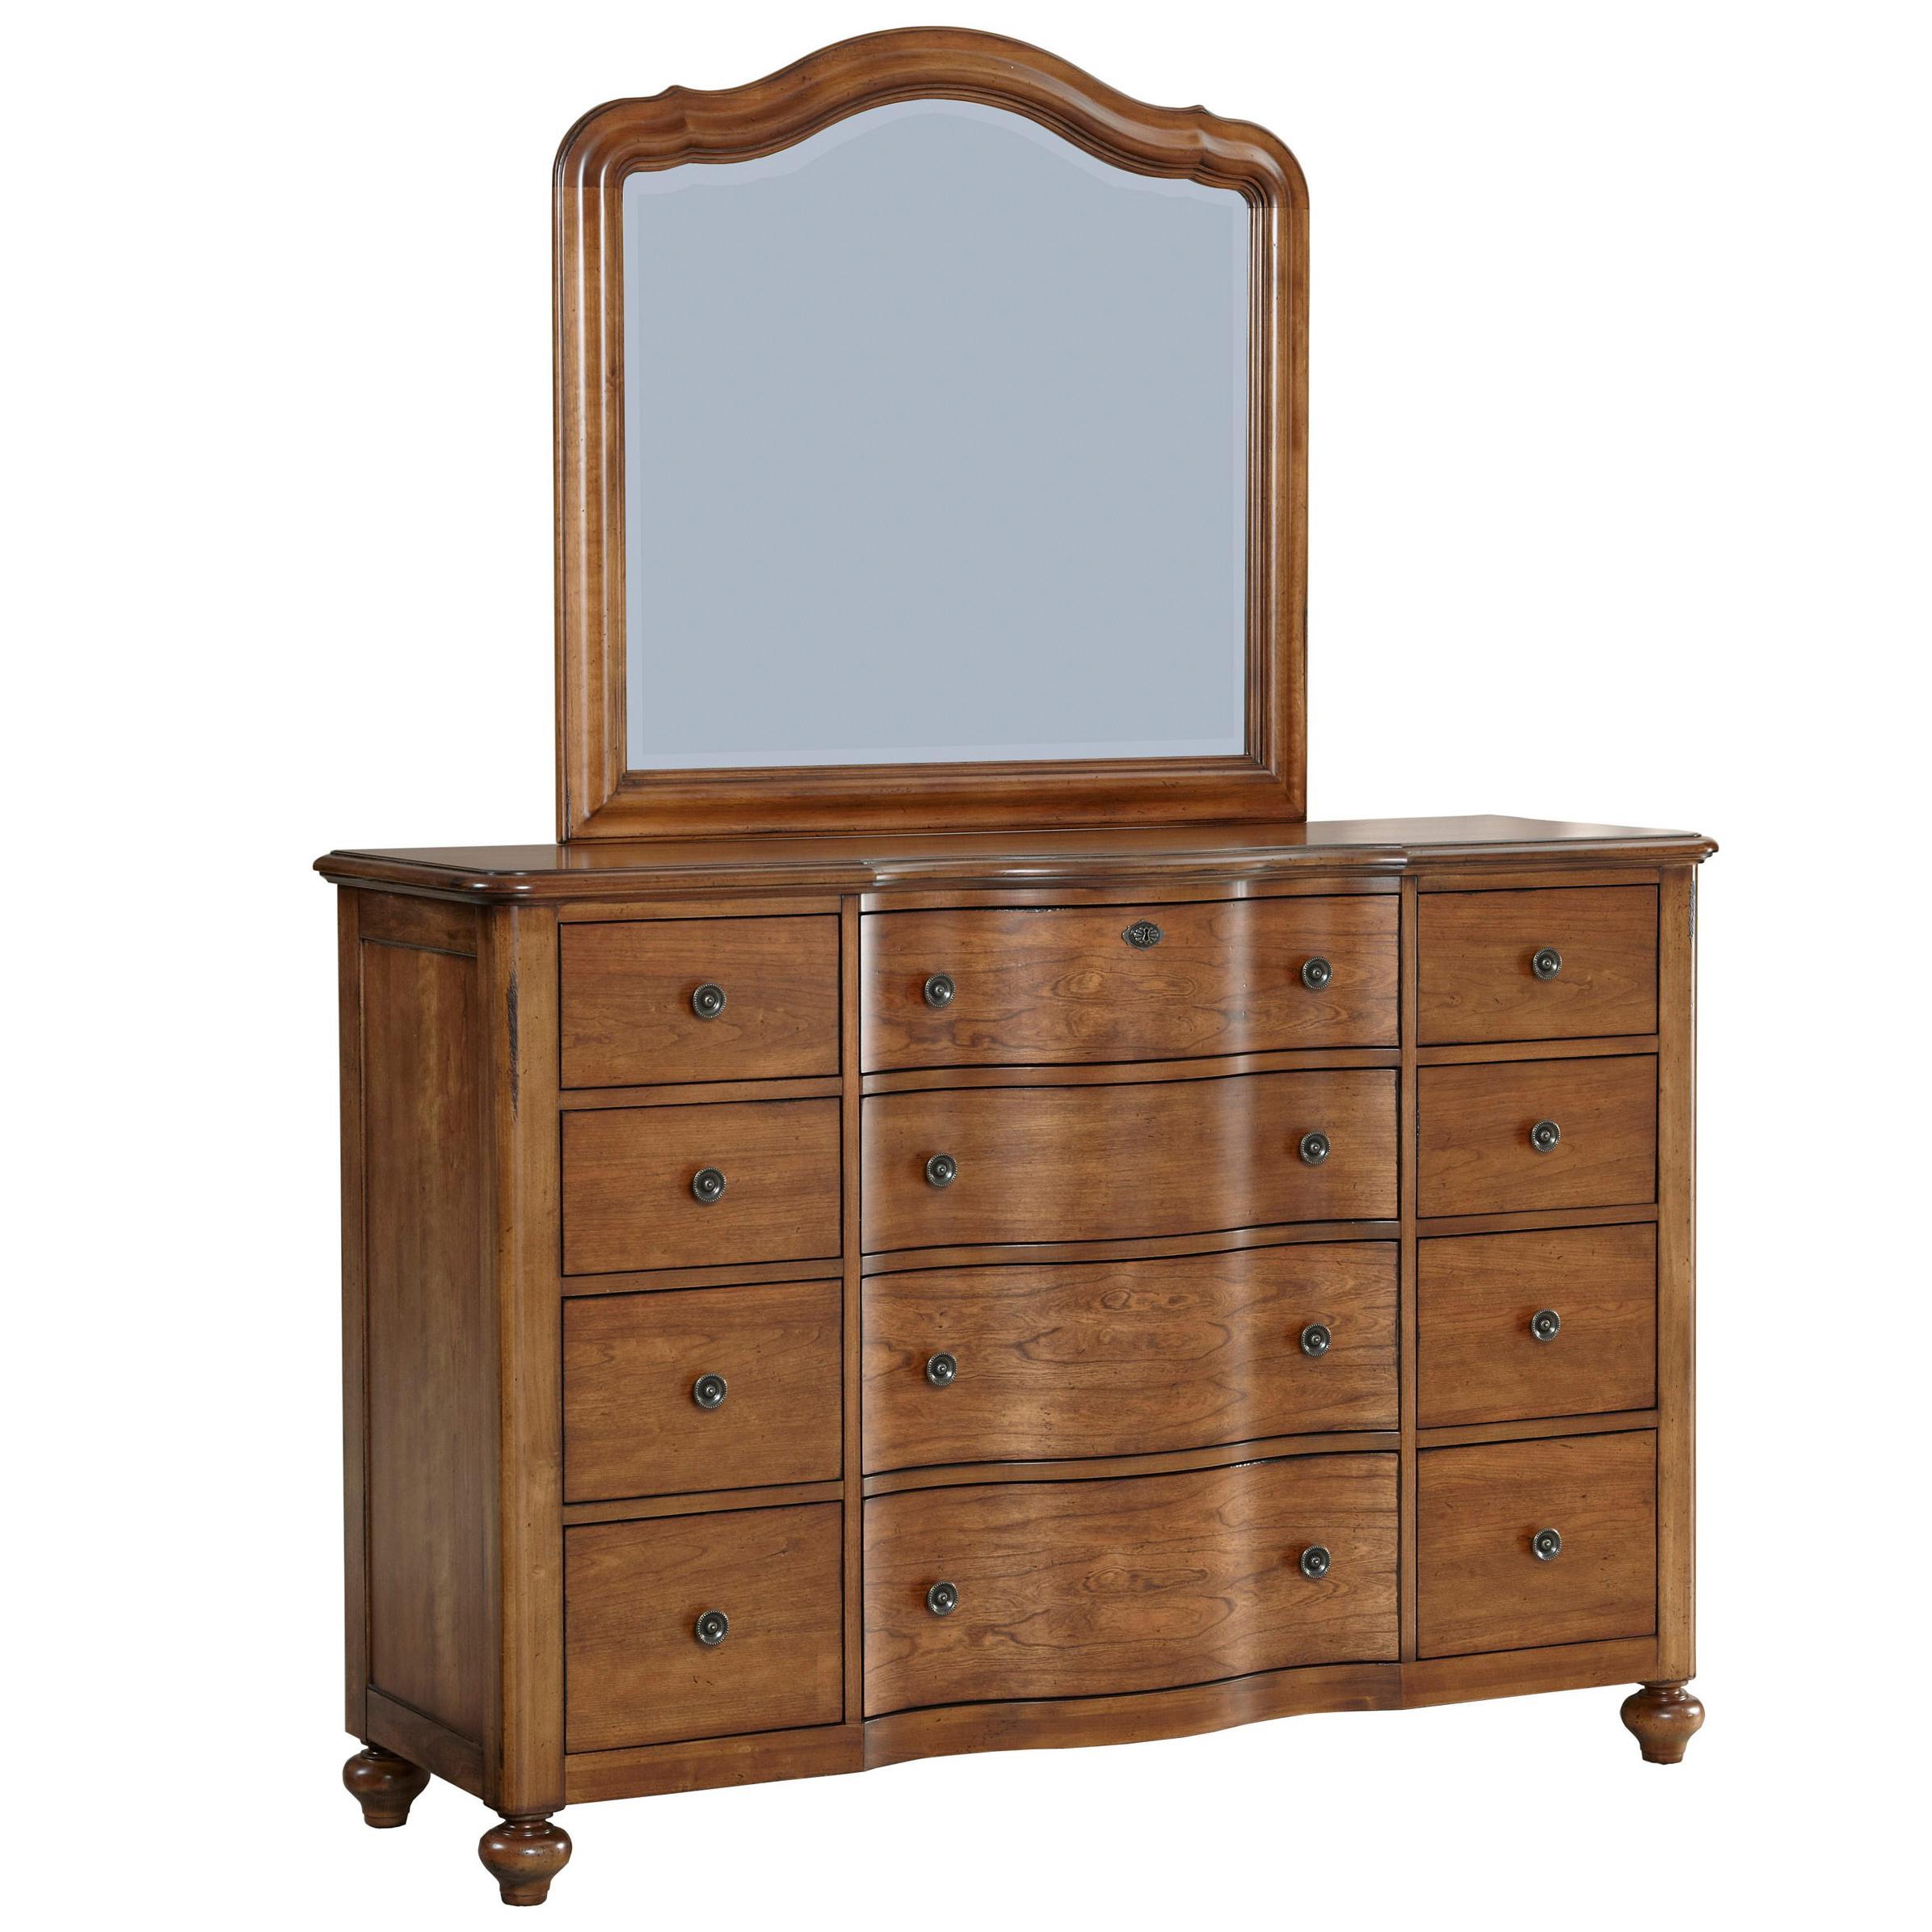 Broyhill Furniture Creswell 12 Drawer Chesser And Mirror Set   AHFA    Dresser U0026 Mirror Dealer Locator